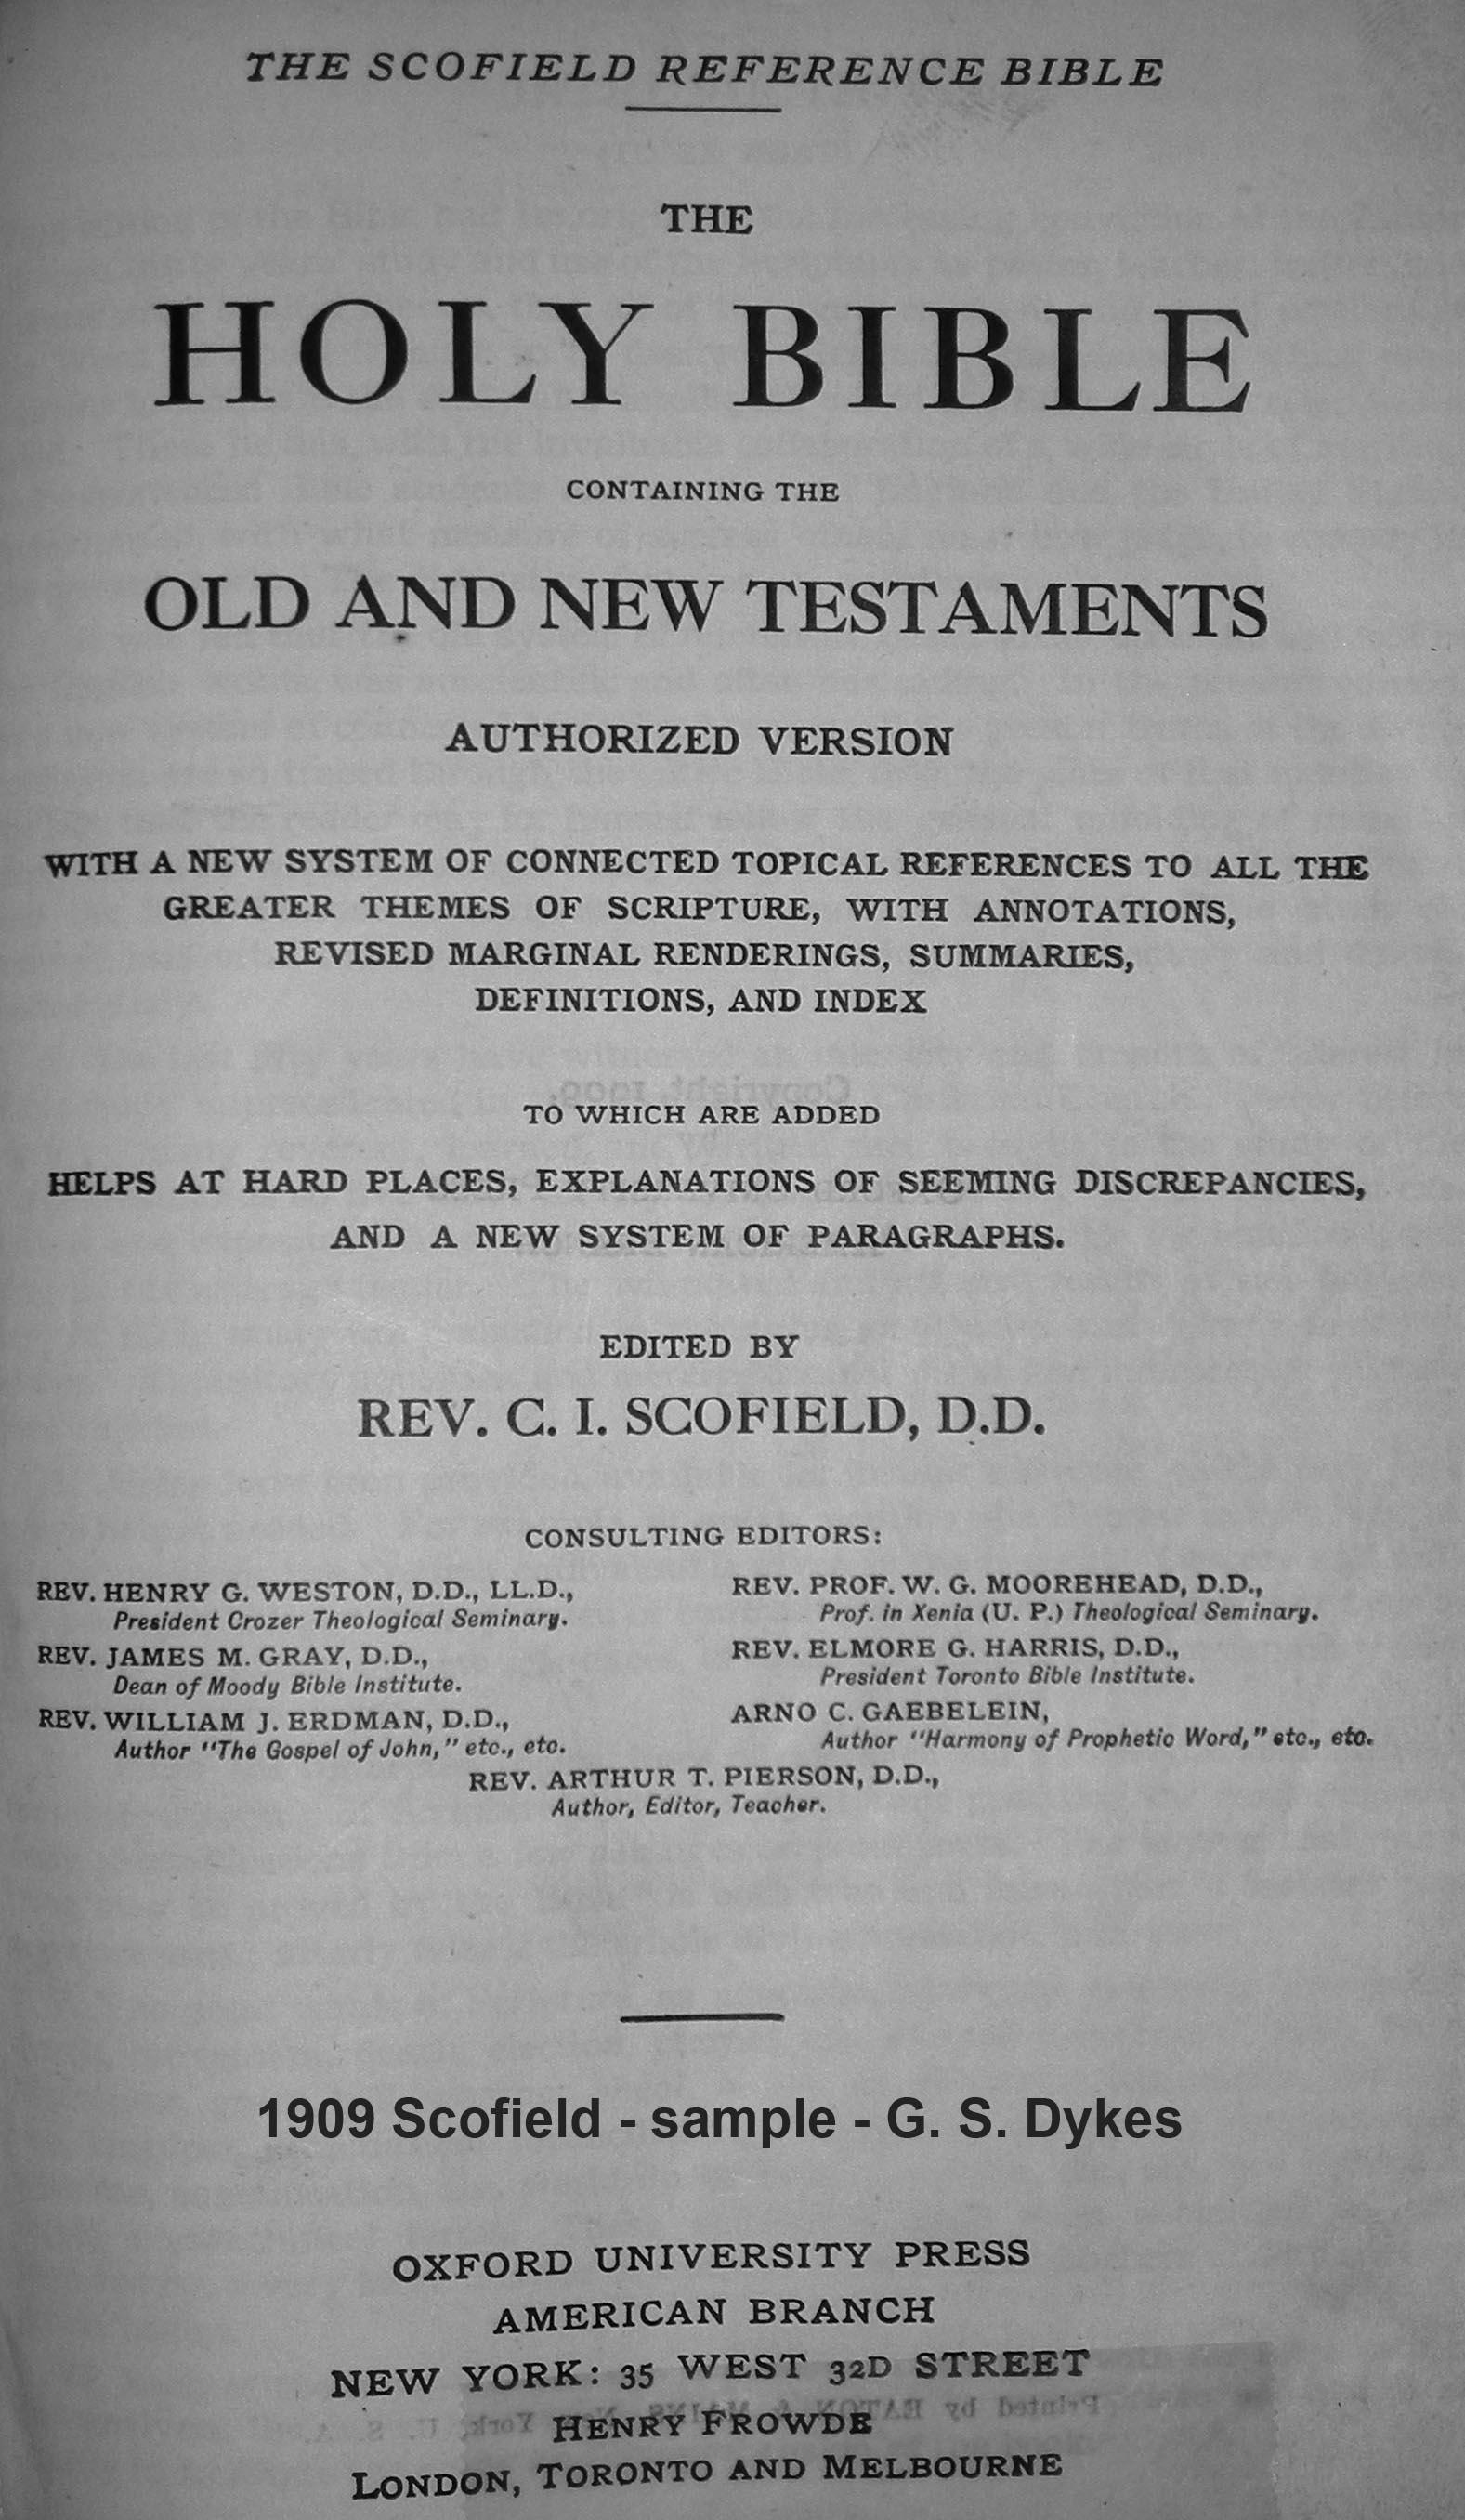 essay referencing bible Bibme free bibliography & citation maker - mla, apa, chicago, harvard.